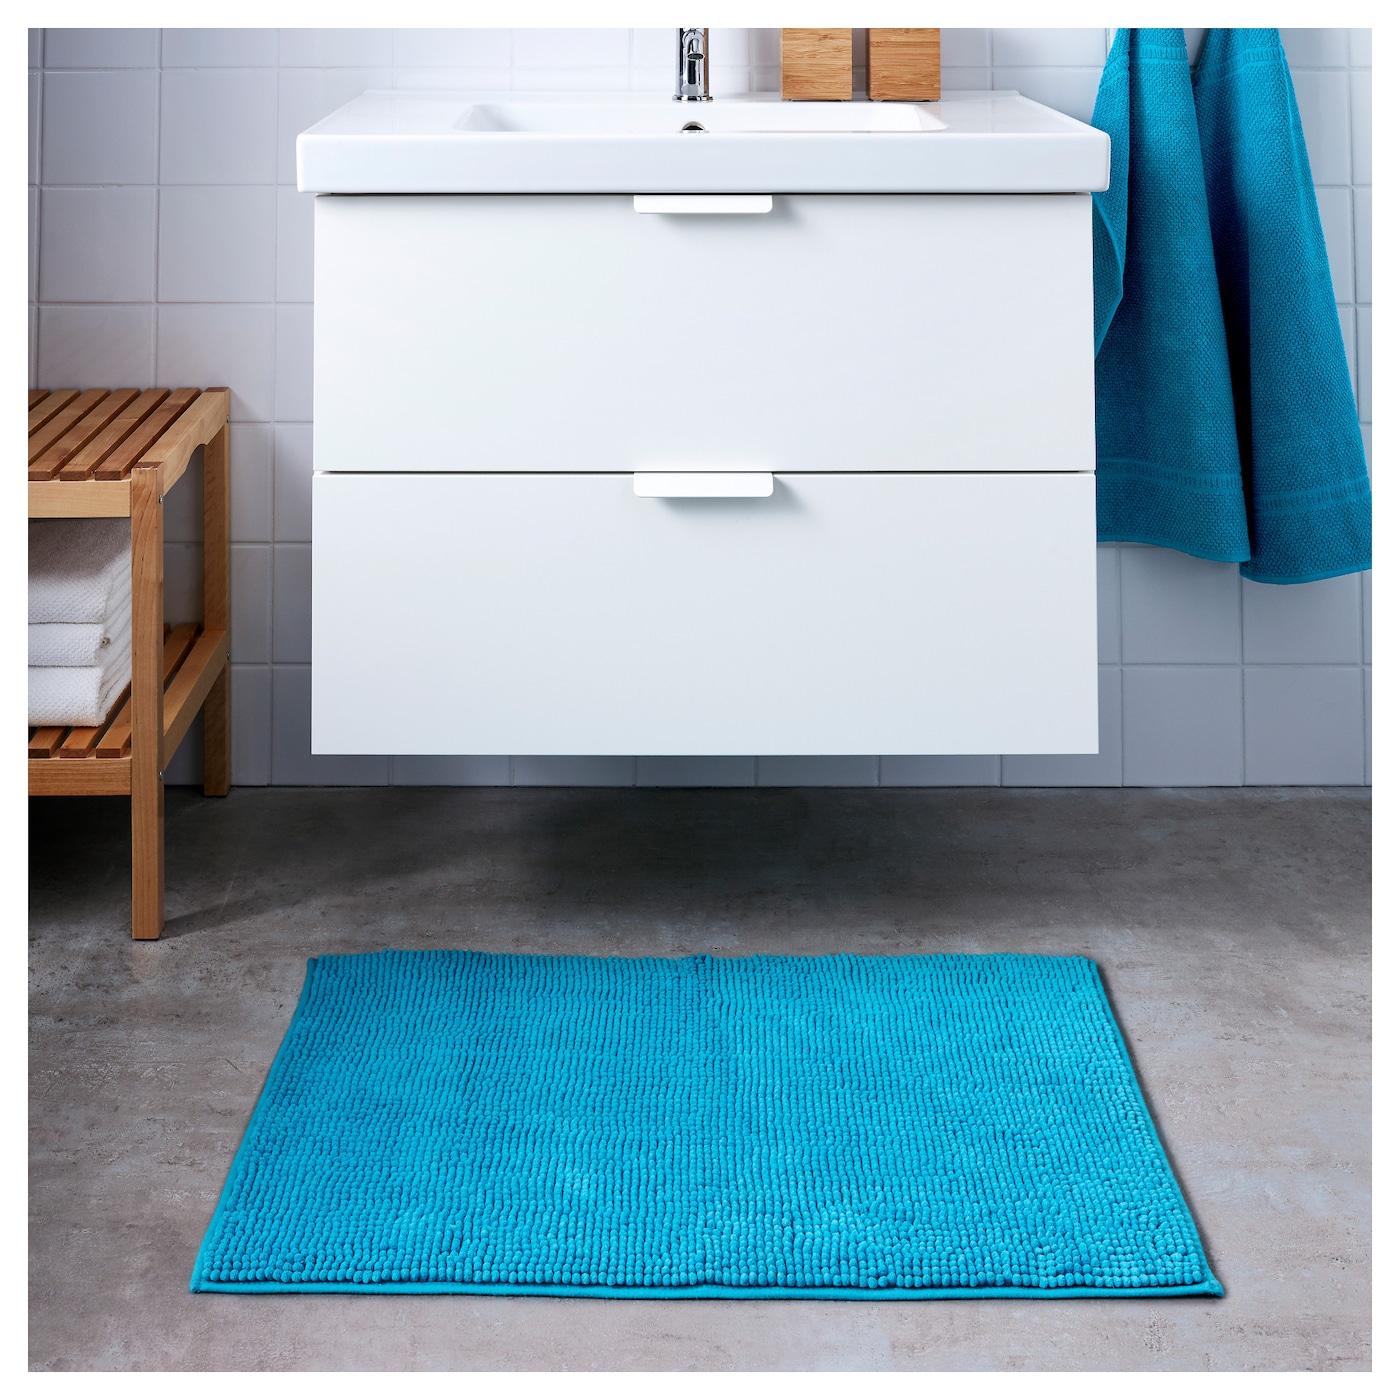 toftbo tapis de bain turquoise 60x90 cm ikea. Black Bedroom Furniture Sets. Home Design Ideas